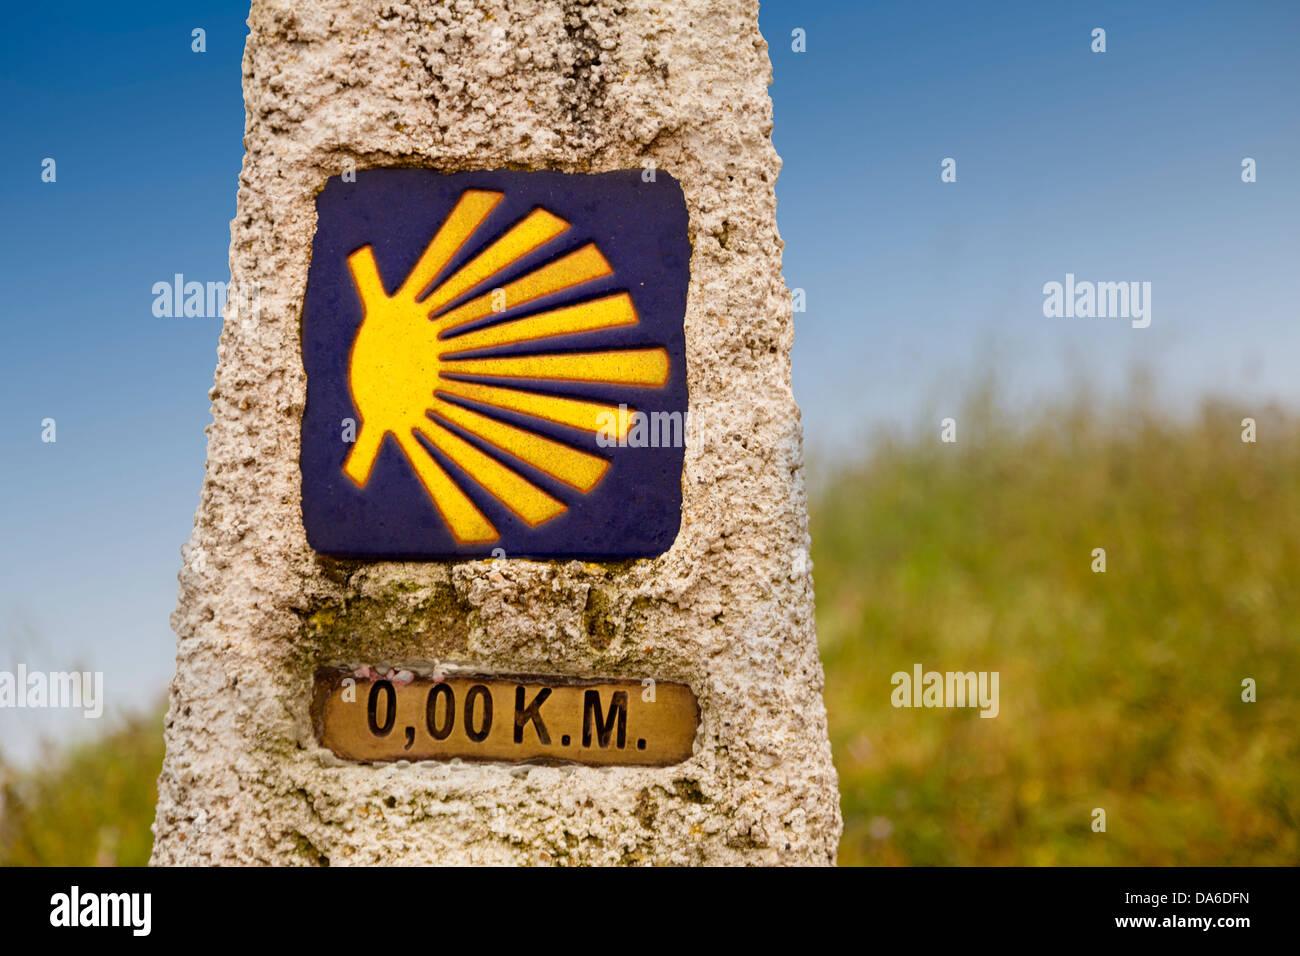 End of Camino Xacobeo de Santiago Lighthouse Fisterra Costa de la Muerte La Coruña Galicia Spain - Stock Image